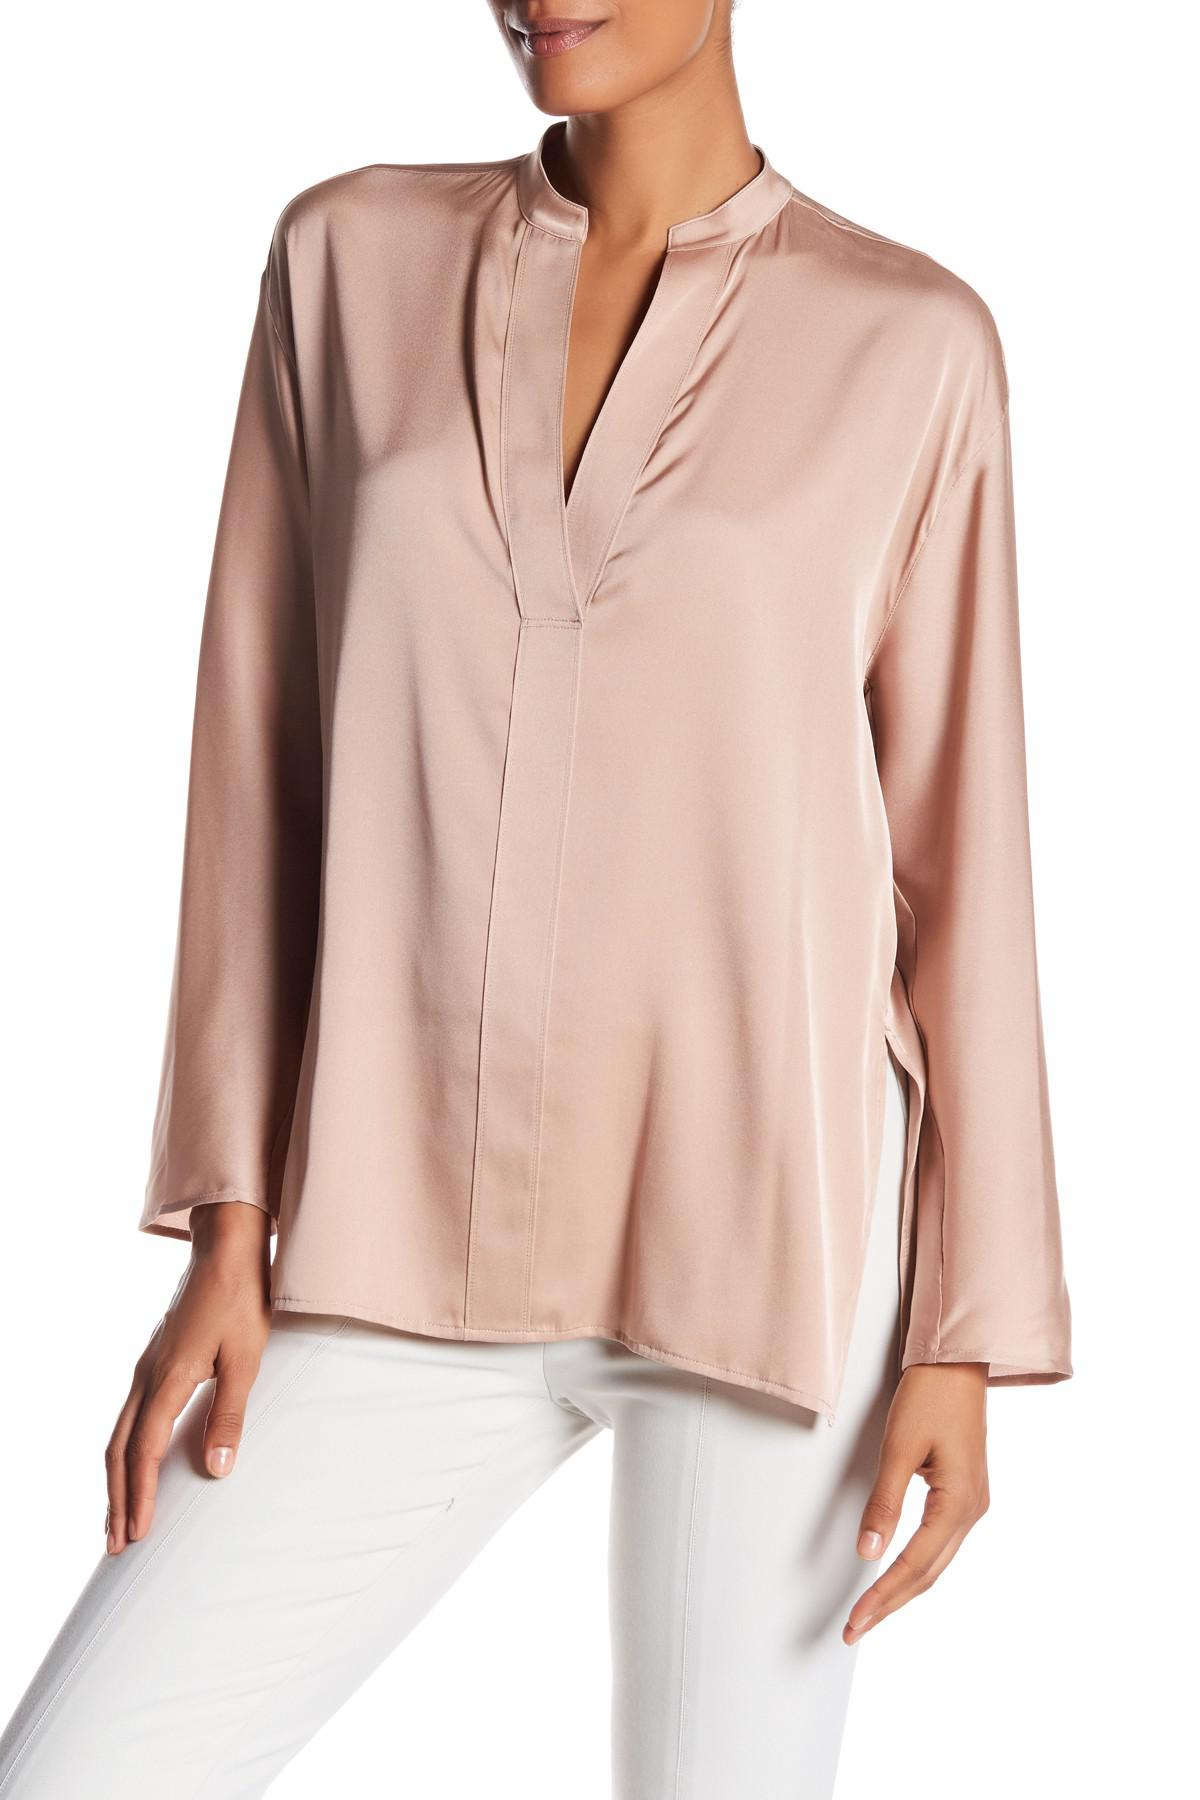 e2acbe5b2 Vince Split V-neck Silk Blend Blouse in Pink - Lyst